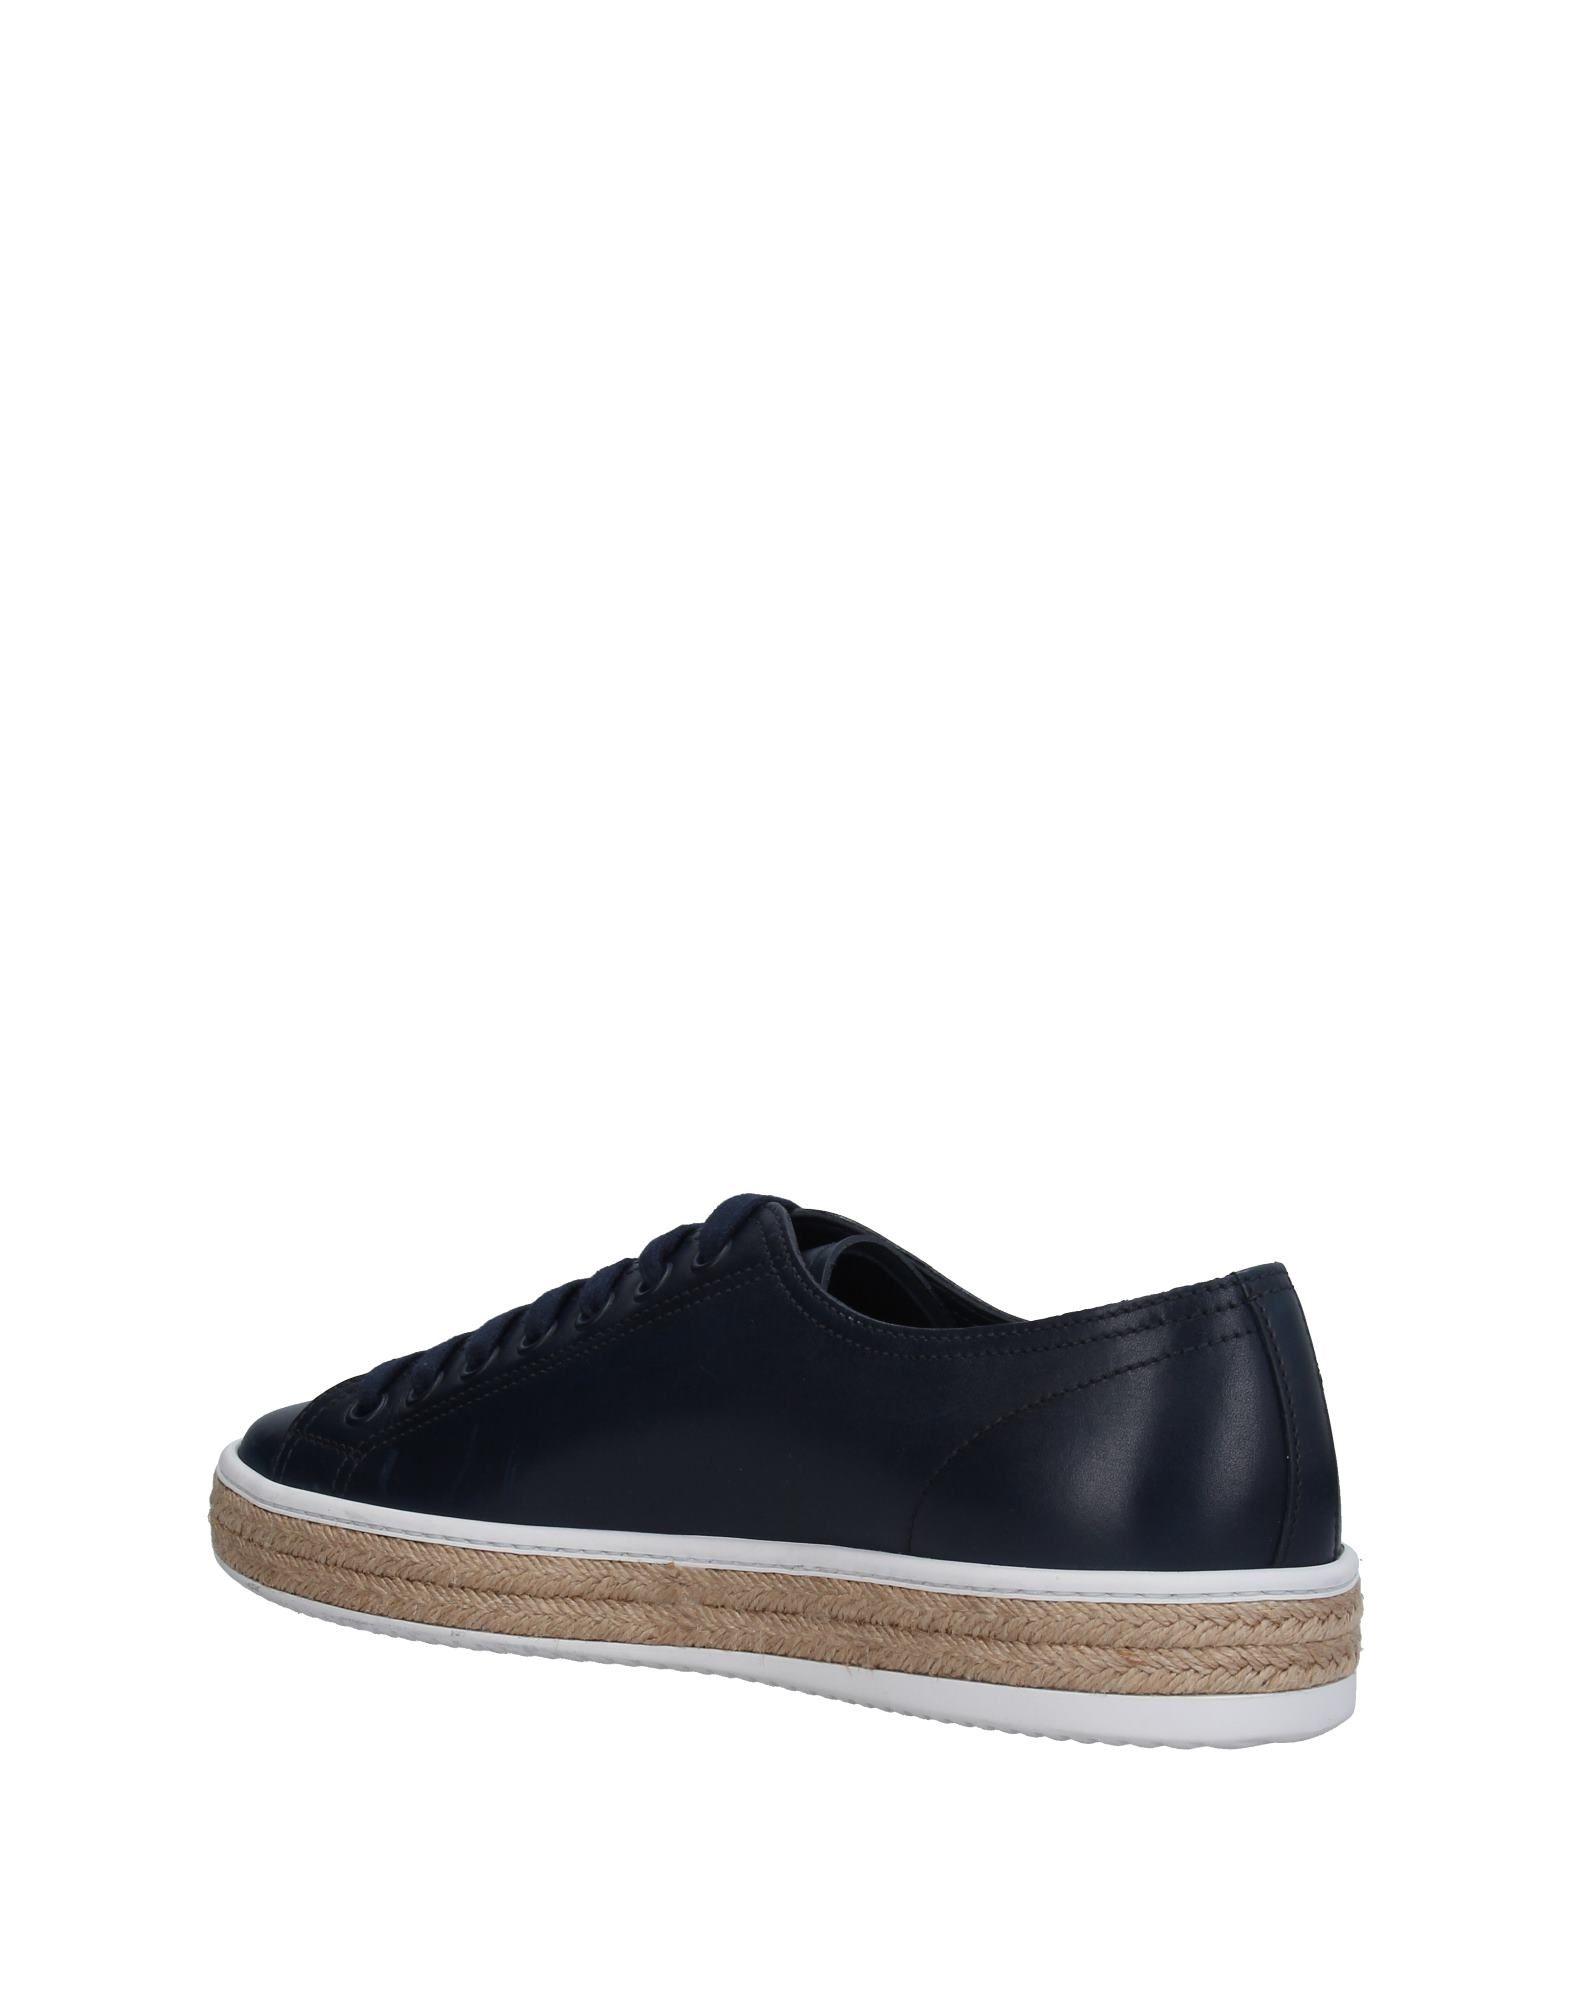 Prada Sport Sneakers Herren  11259090CI Gute Qualität beliebte Schuhe